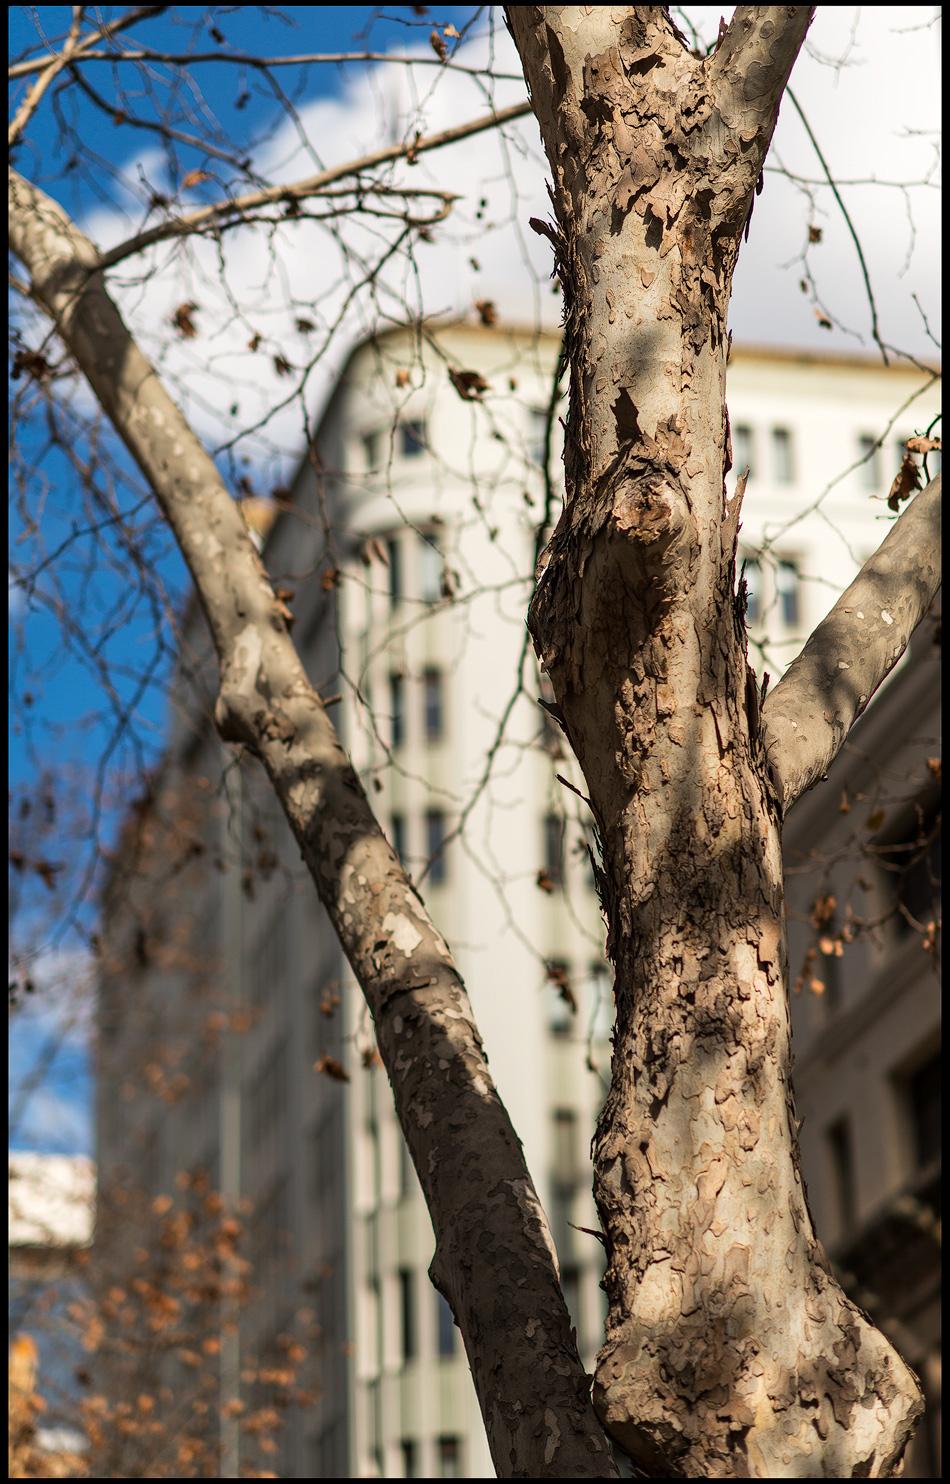 The-tree.jpg